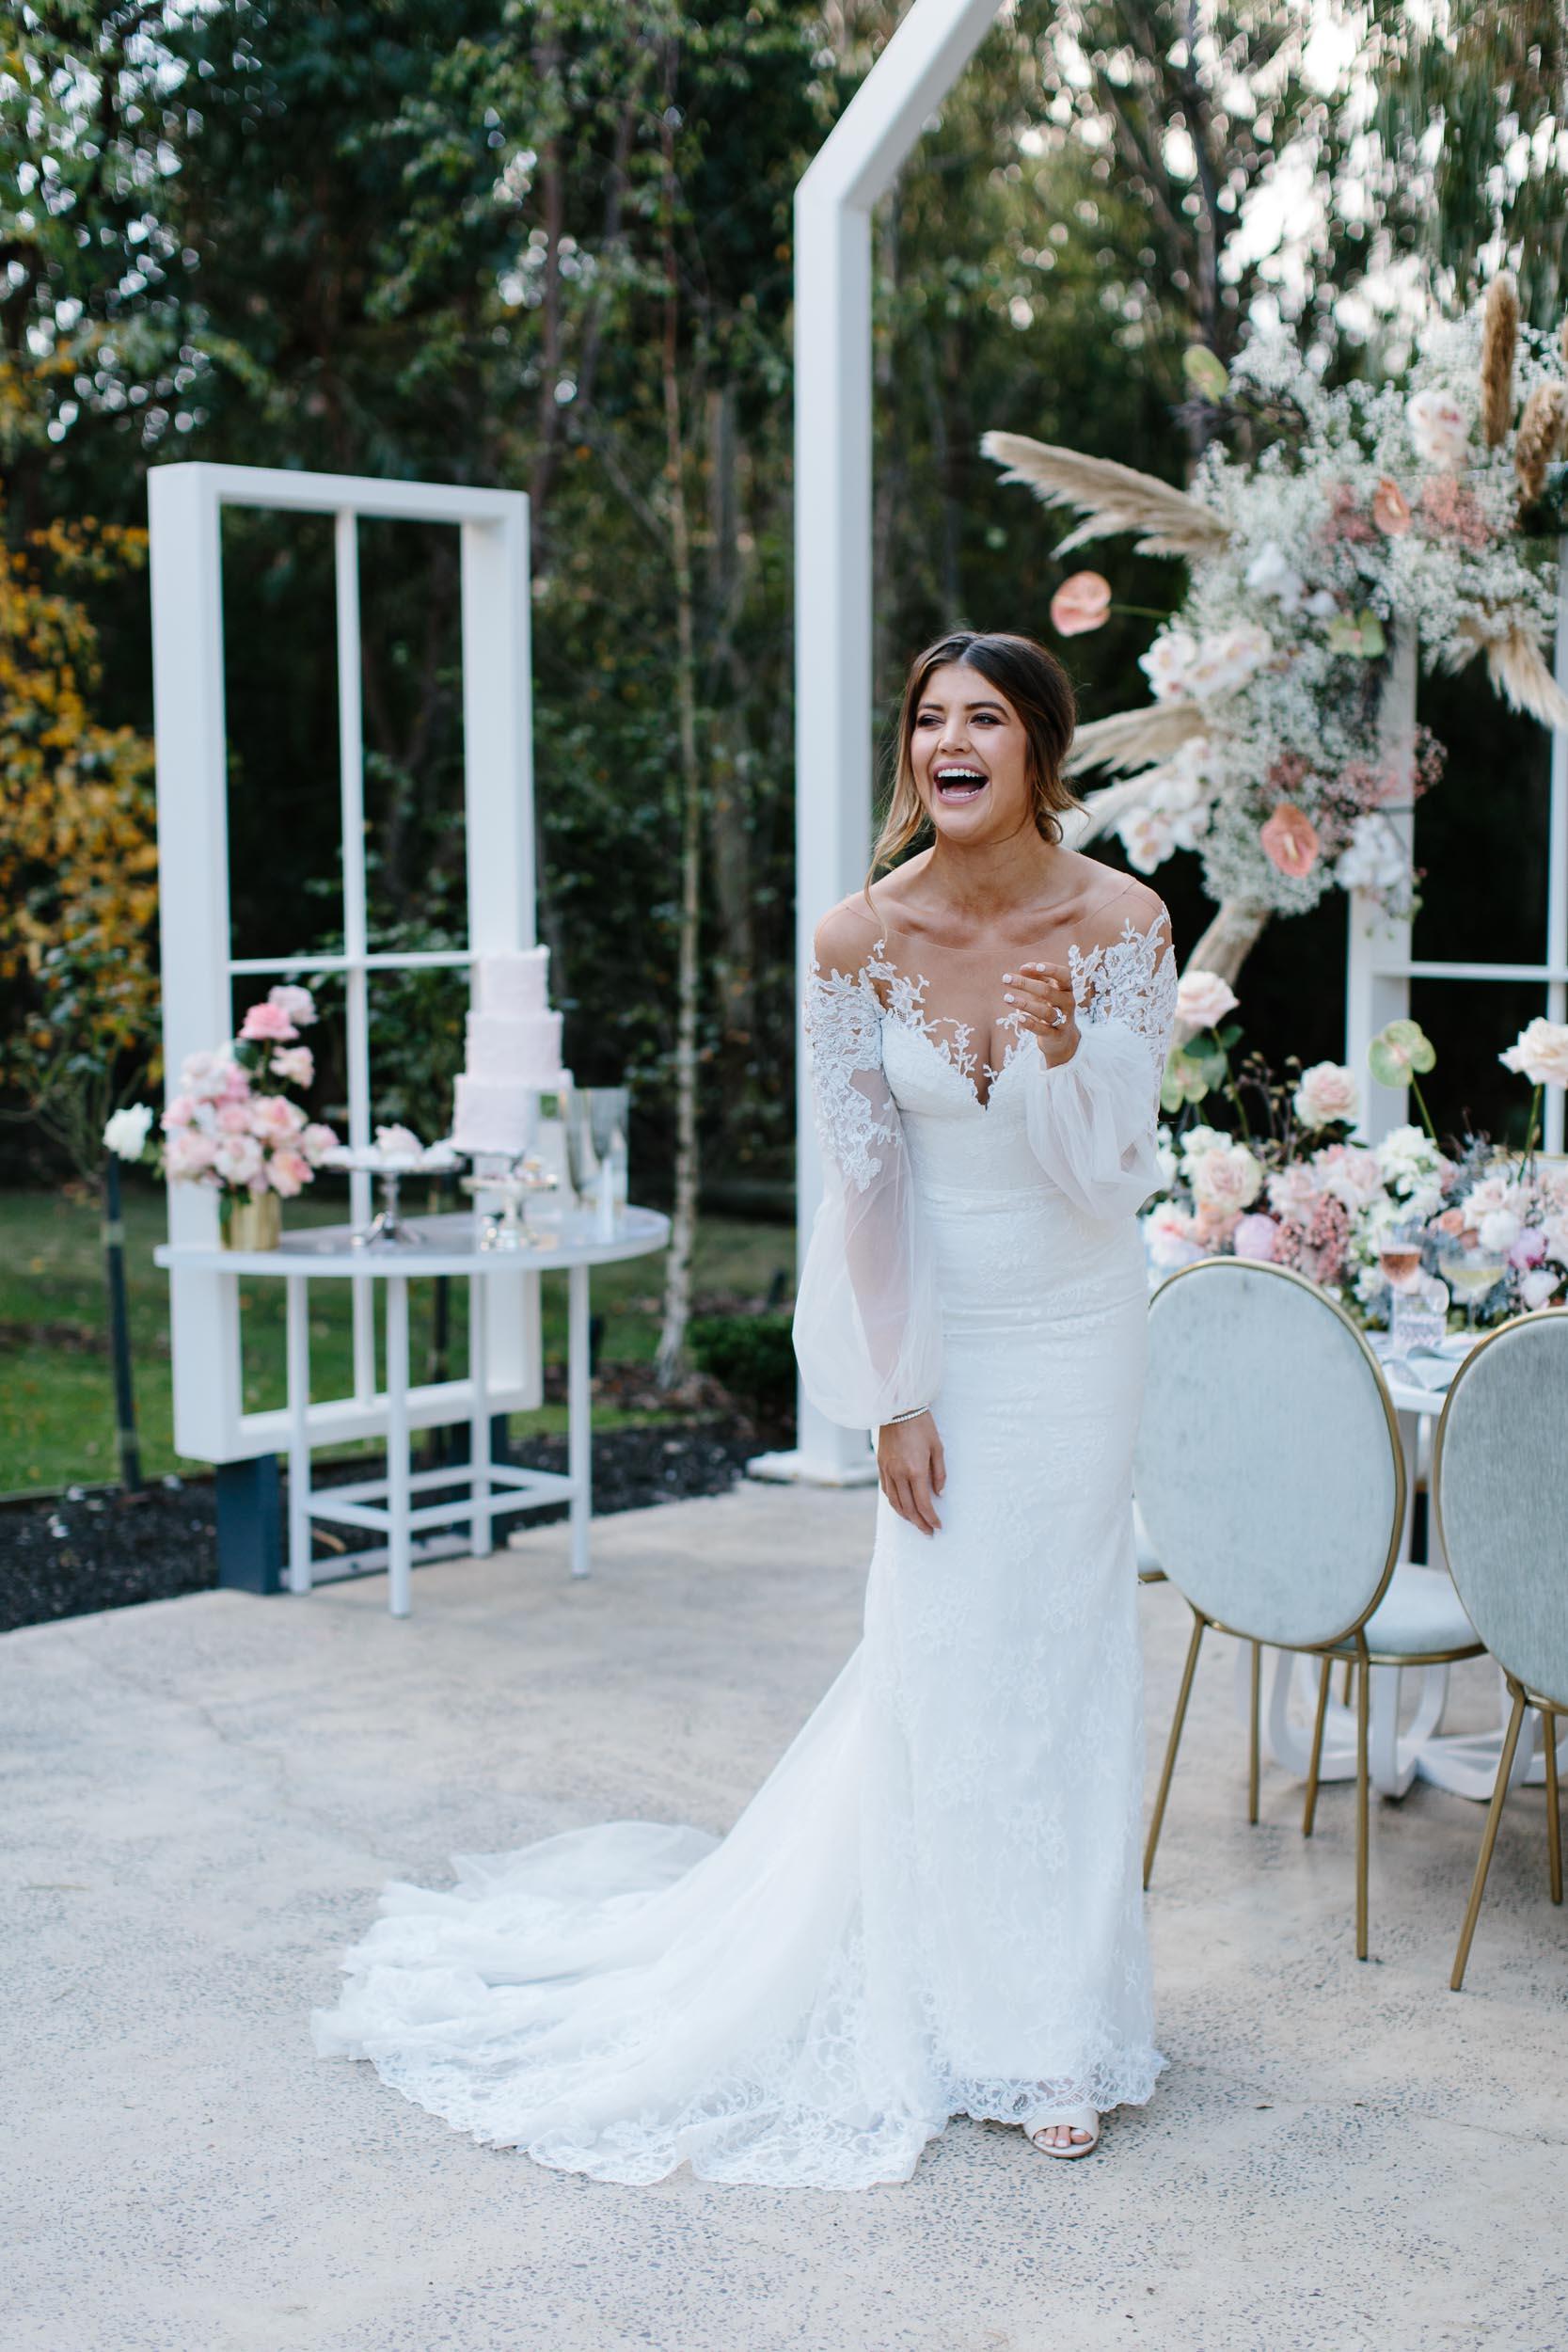 Kas-Richards-LENZO-Yarra-Valley-Wedding-One-Day-Bridal-206.jpg